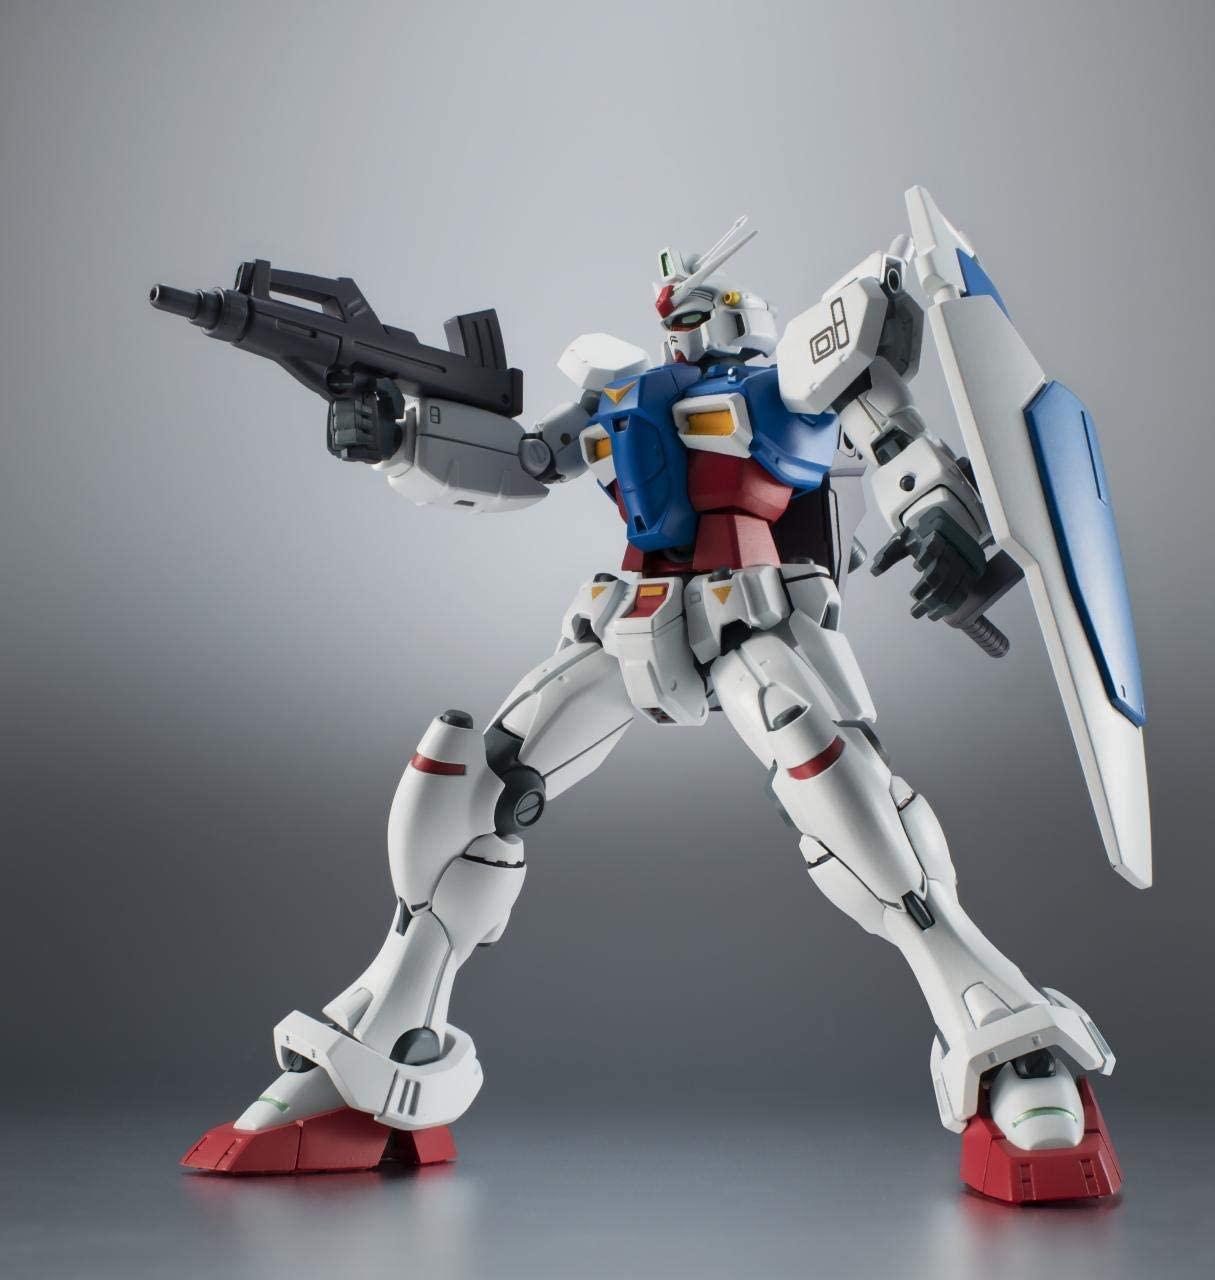 BANDAI RX-78GP01高達原型1號動畫,約125mm ABS&PVC彩繪可動人偶¥7480,約HKD$574